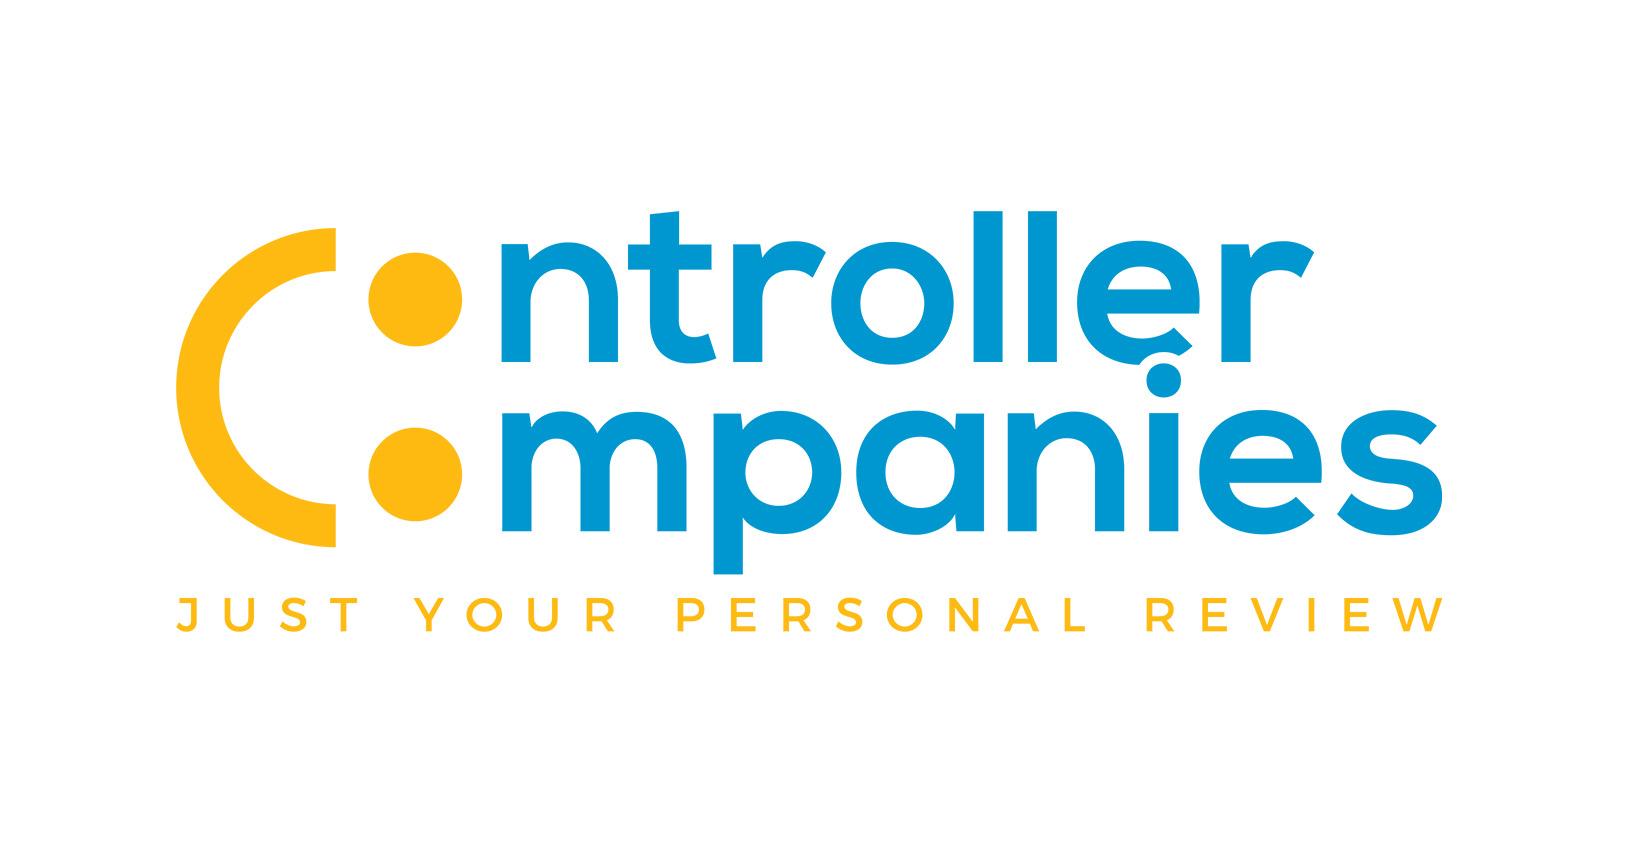 Controller Companies announcement post image logo